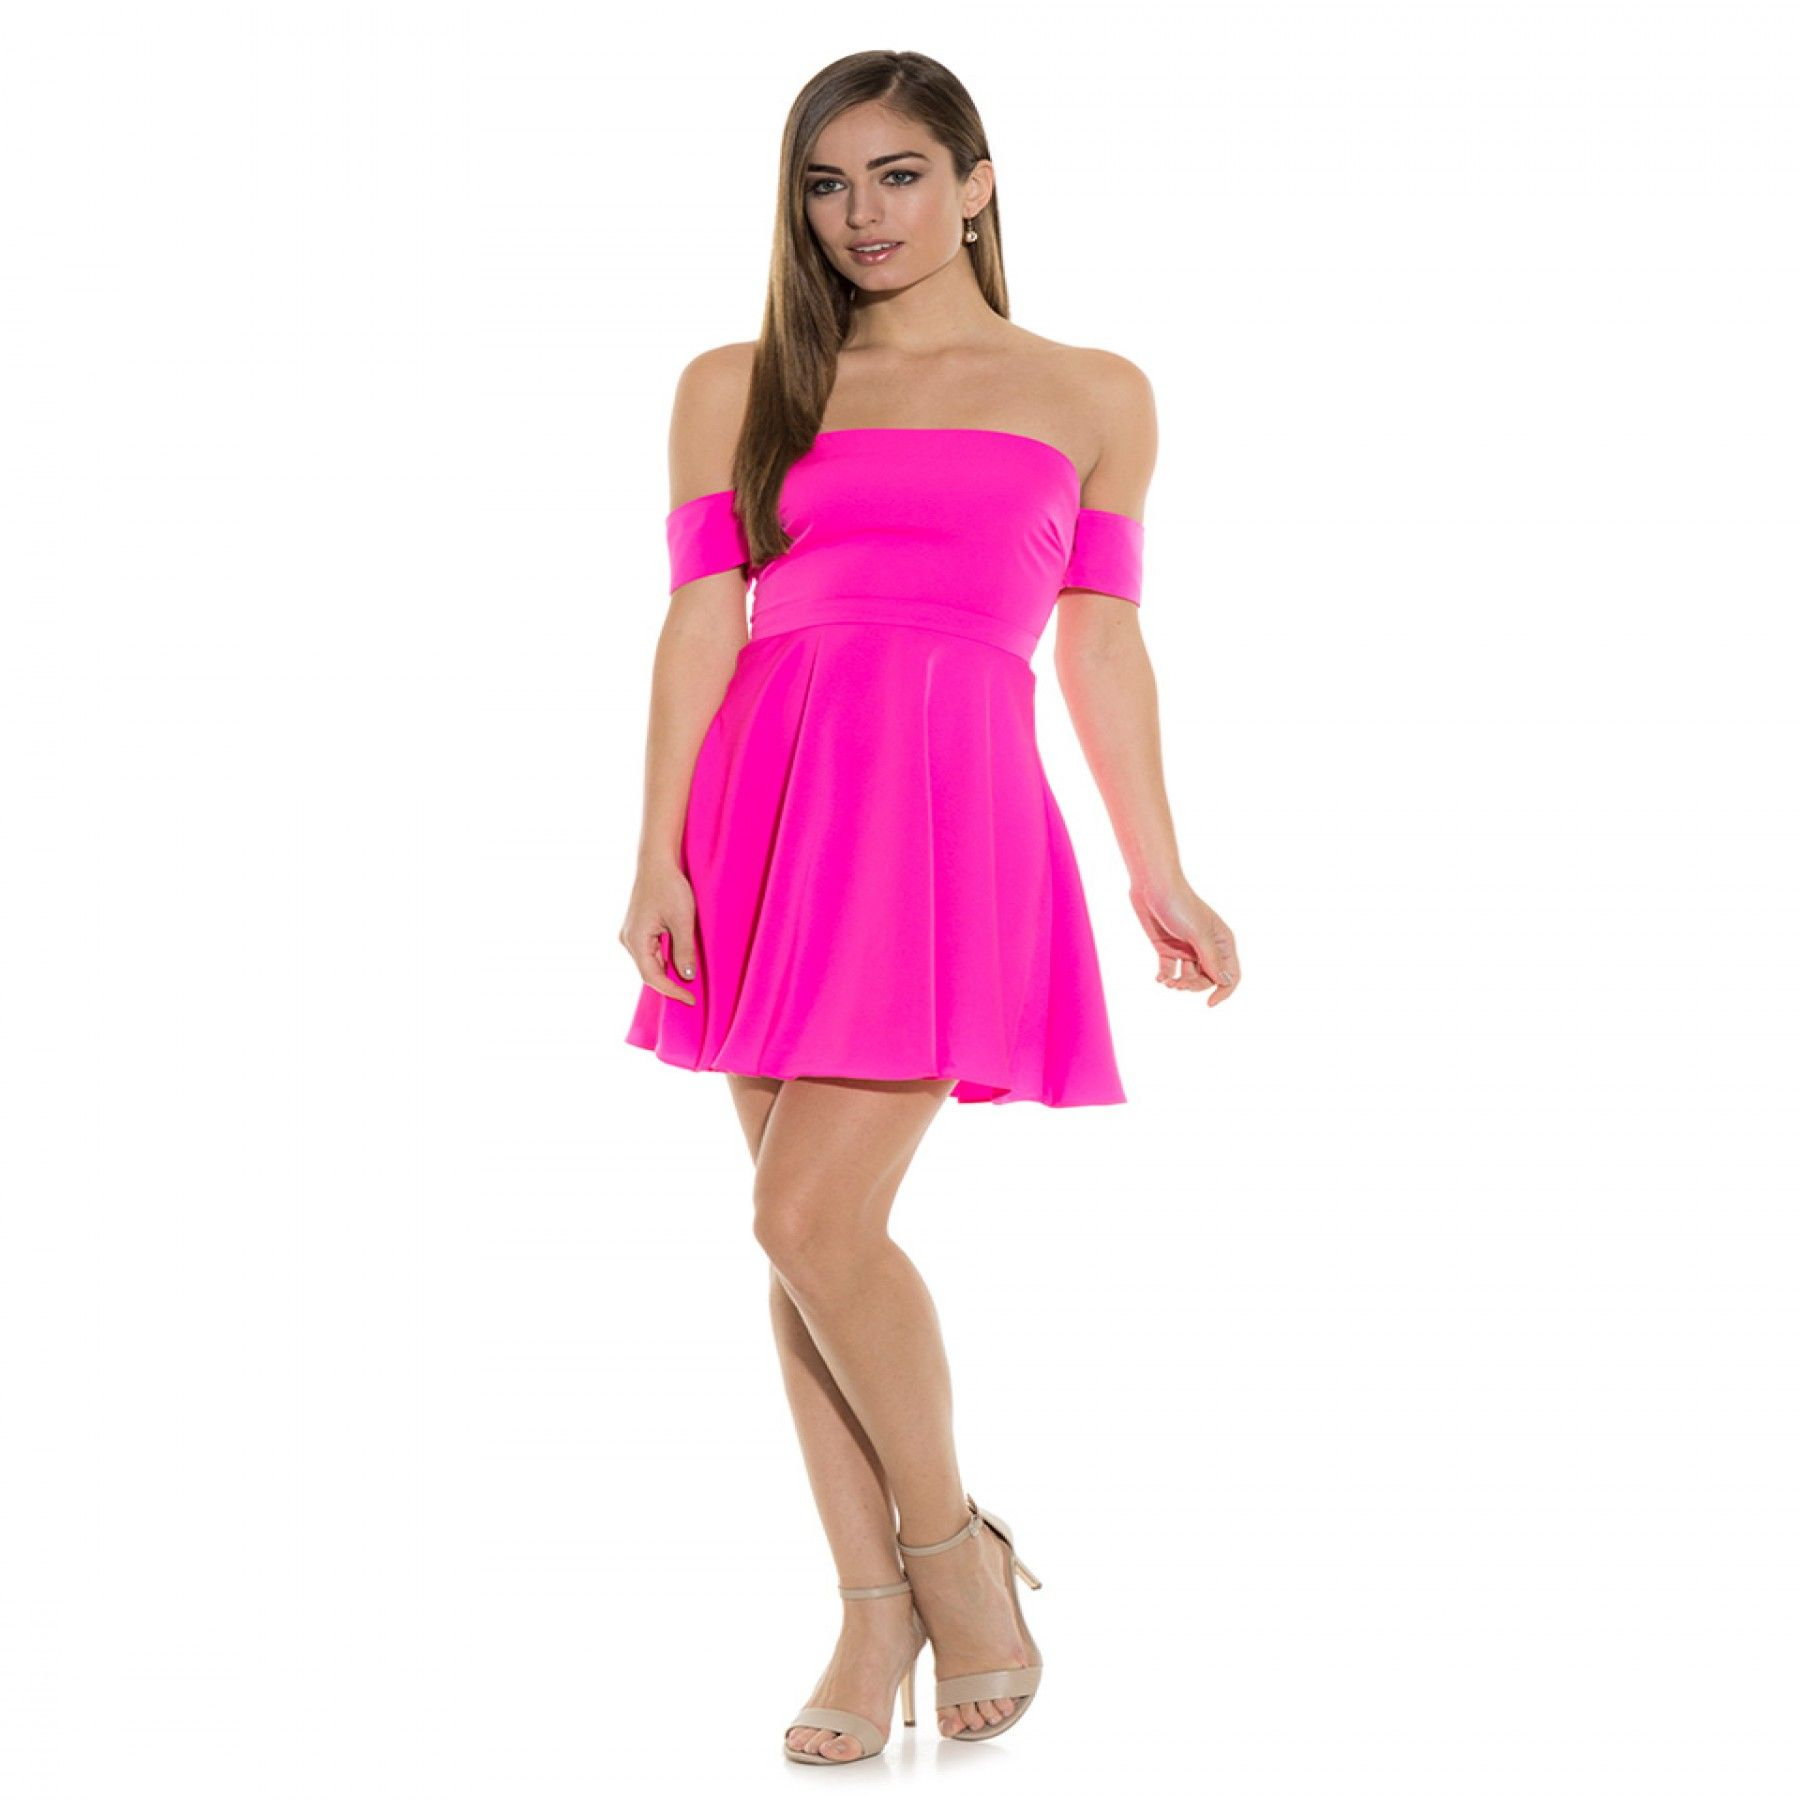 Fantástico Vestidos De Novia Dropship Adorno - Colección de Vestidos ...